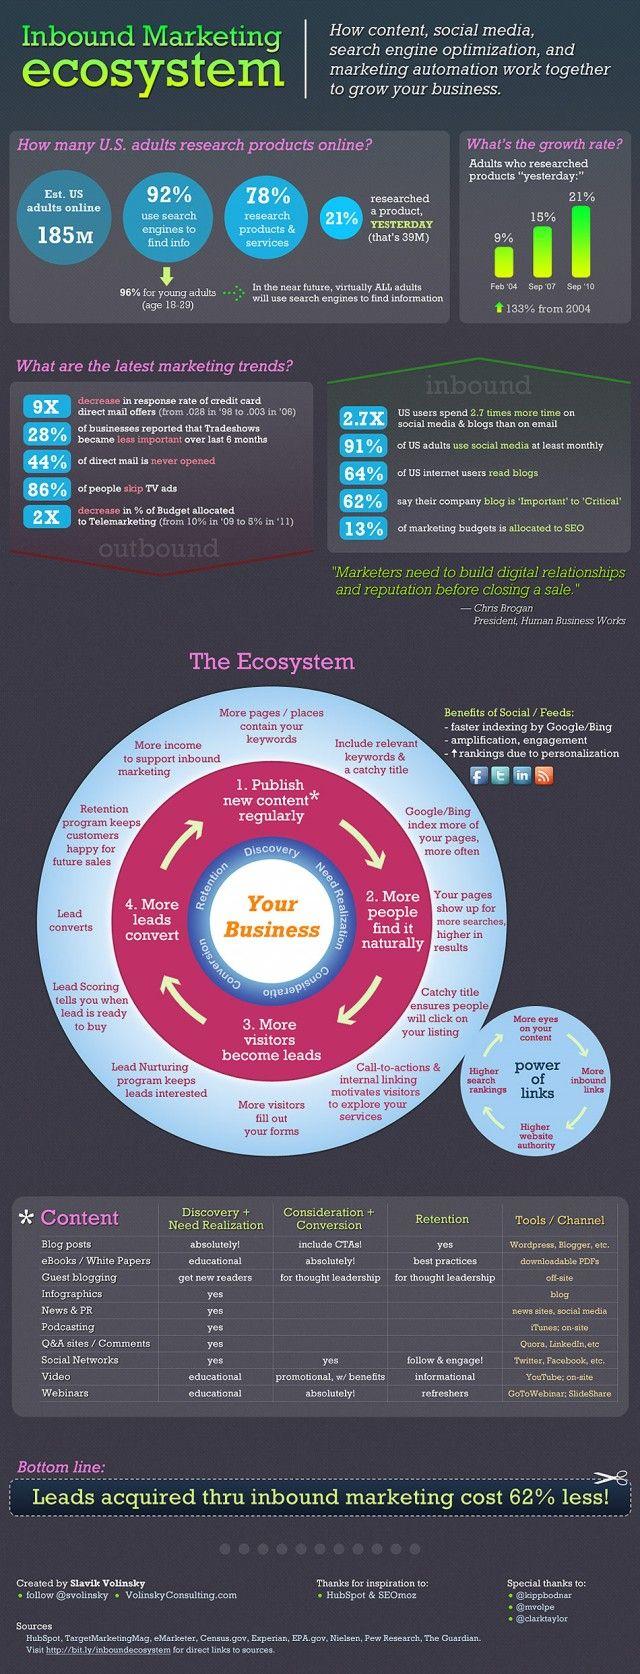 Inbound Marketing EcosystemInternet Marketing, Web Design, Inboundmarketing, Social Media, Marketing Ecosystem, Socialmedia, Business Marketing, Content Marketing, Inbound Marketing